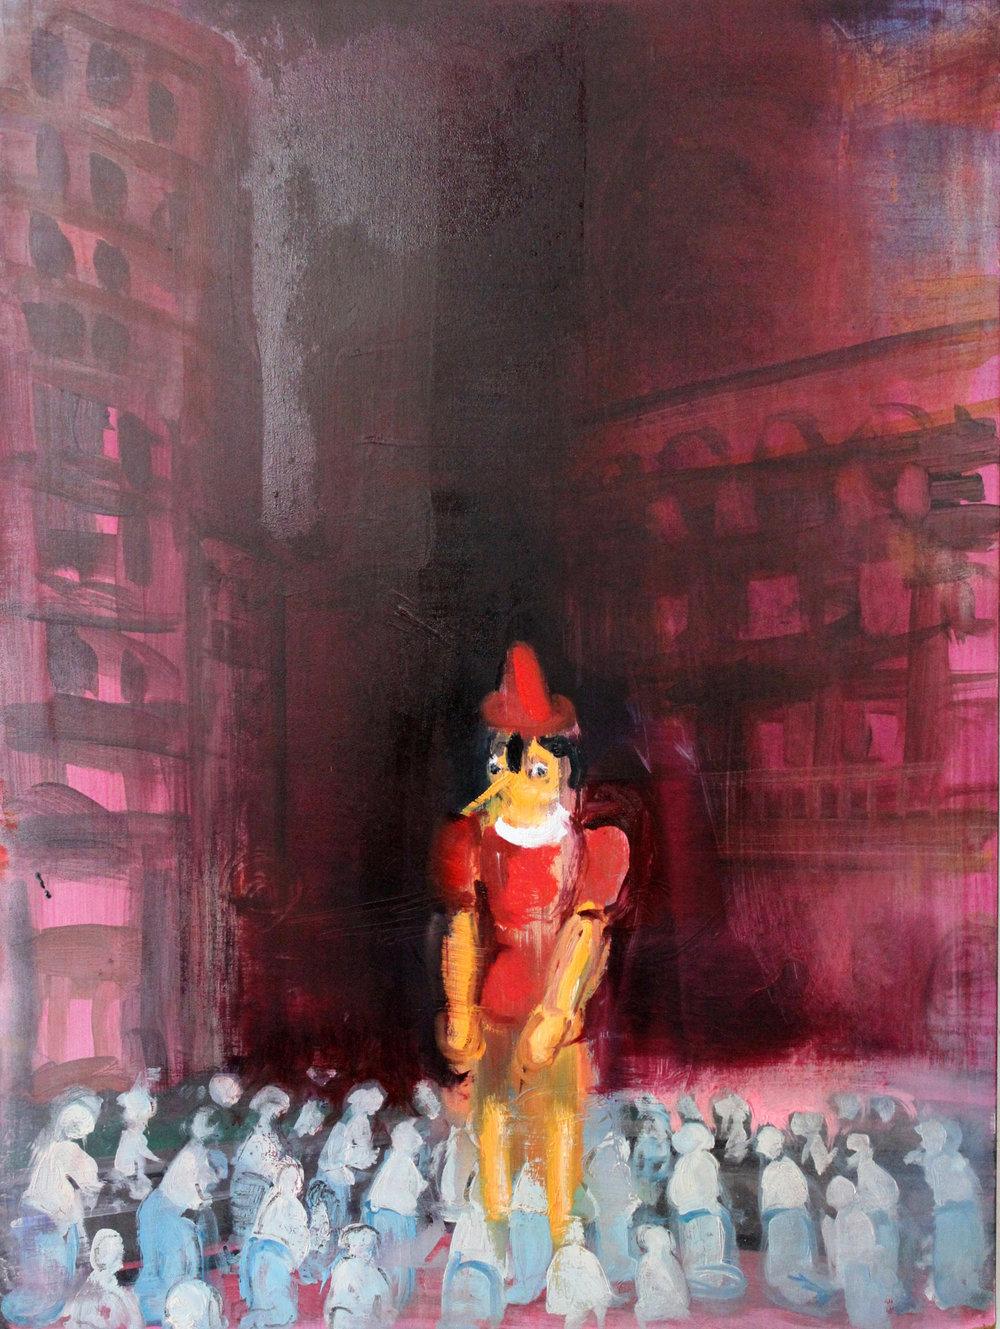 Pinocchio and the Public, 2017